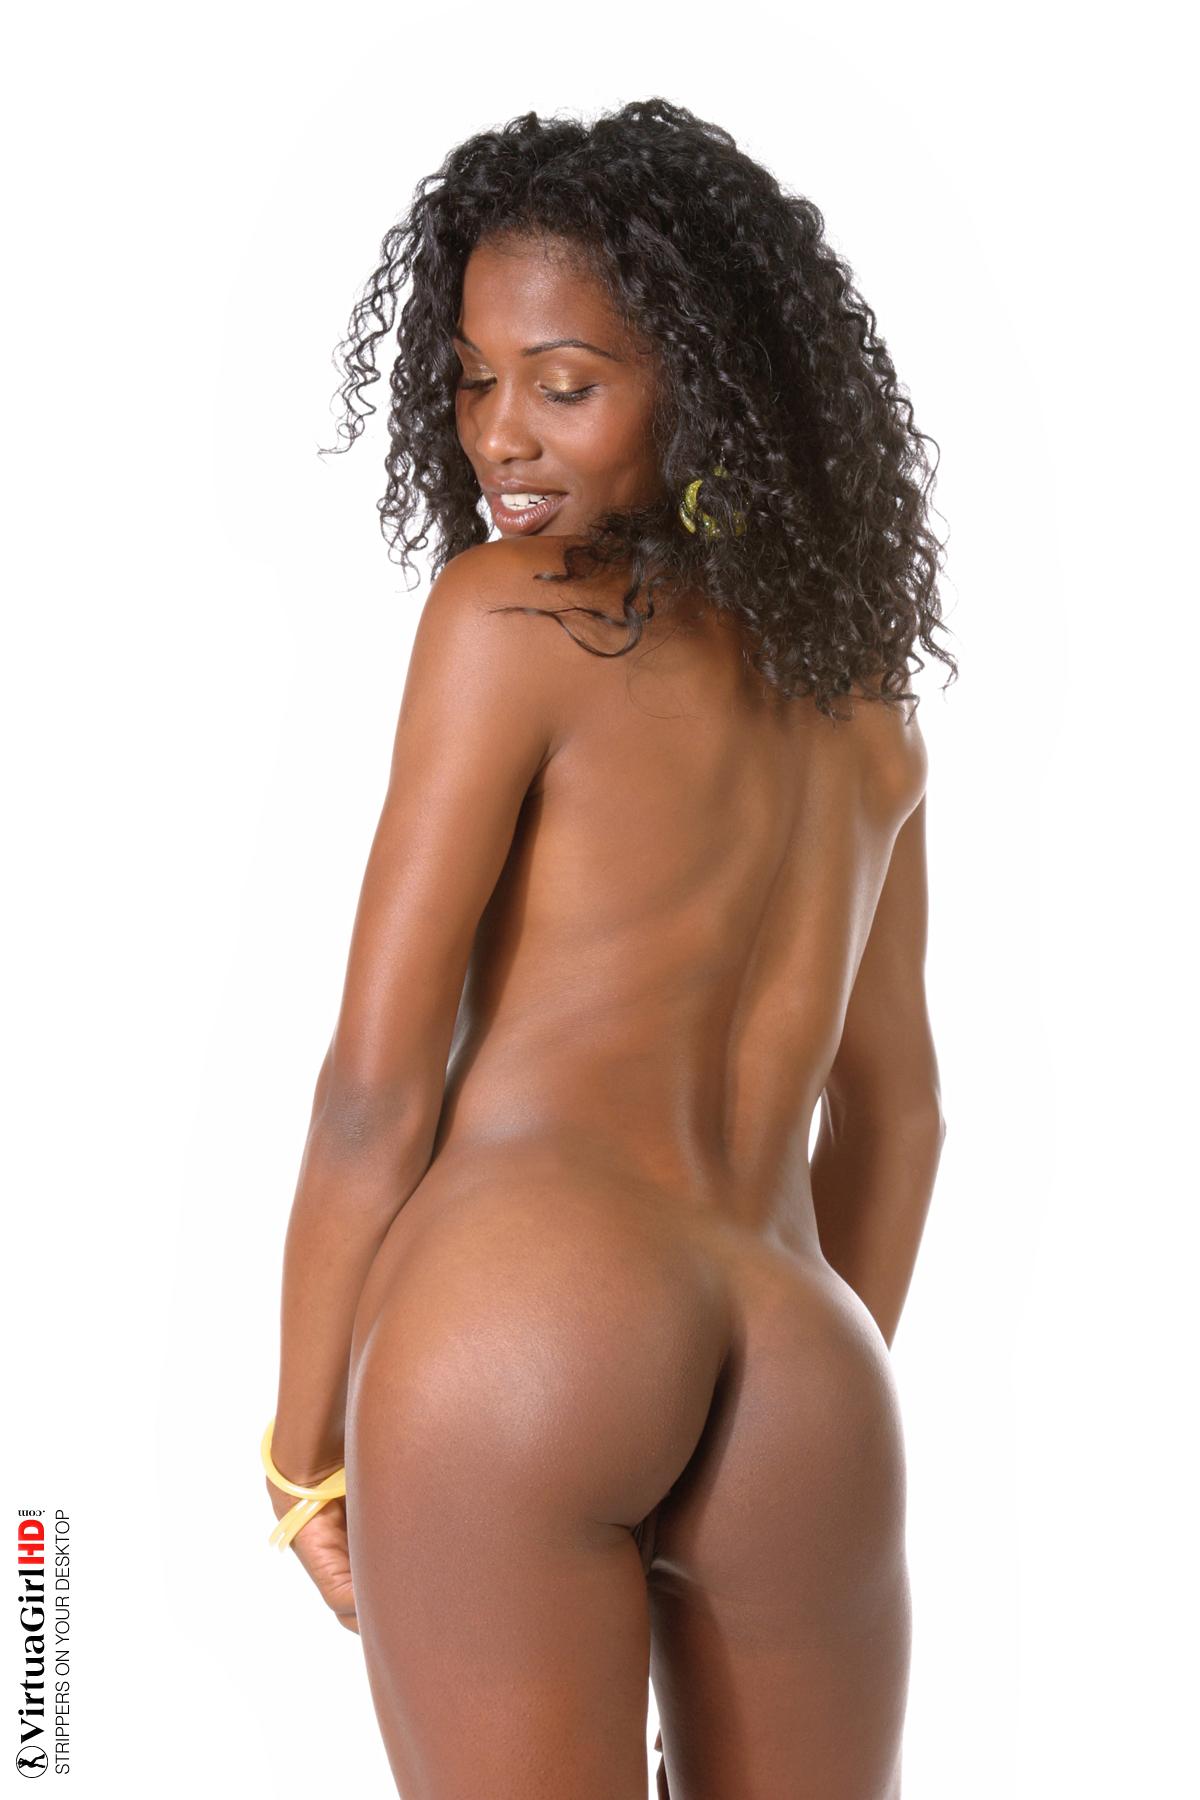 girls stripping nude